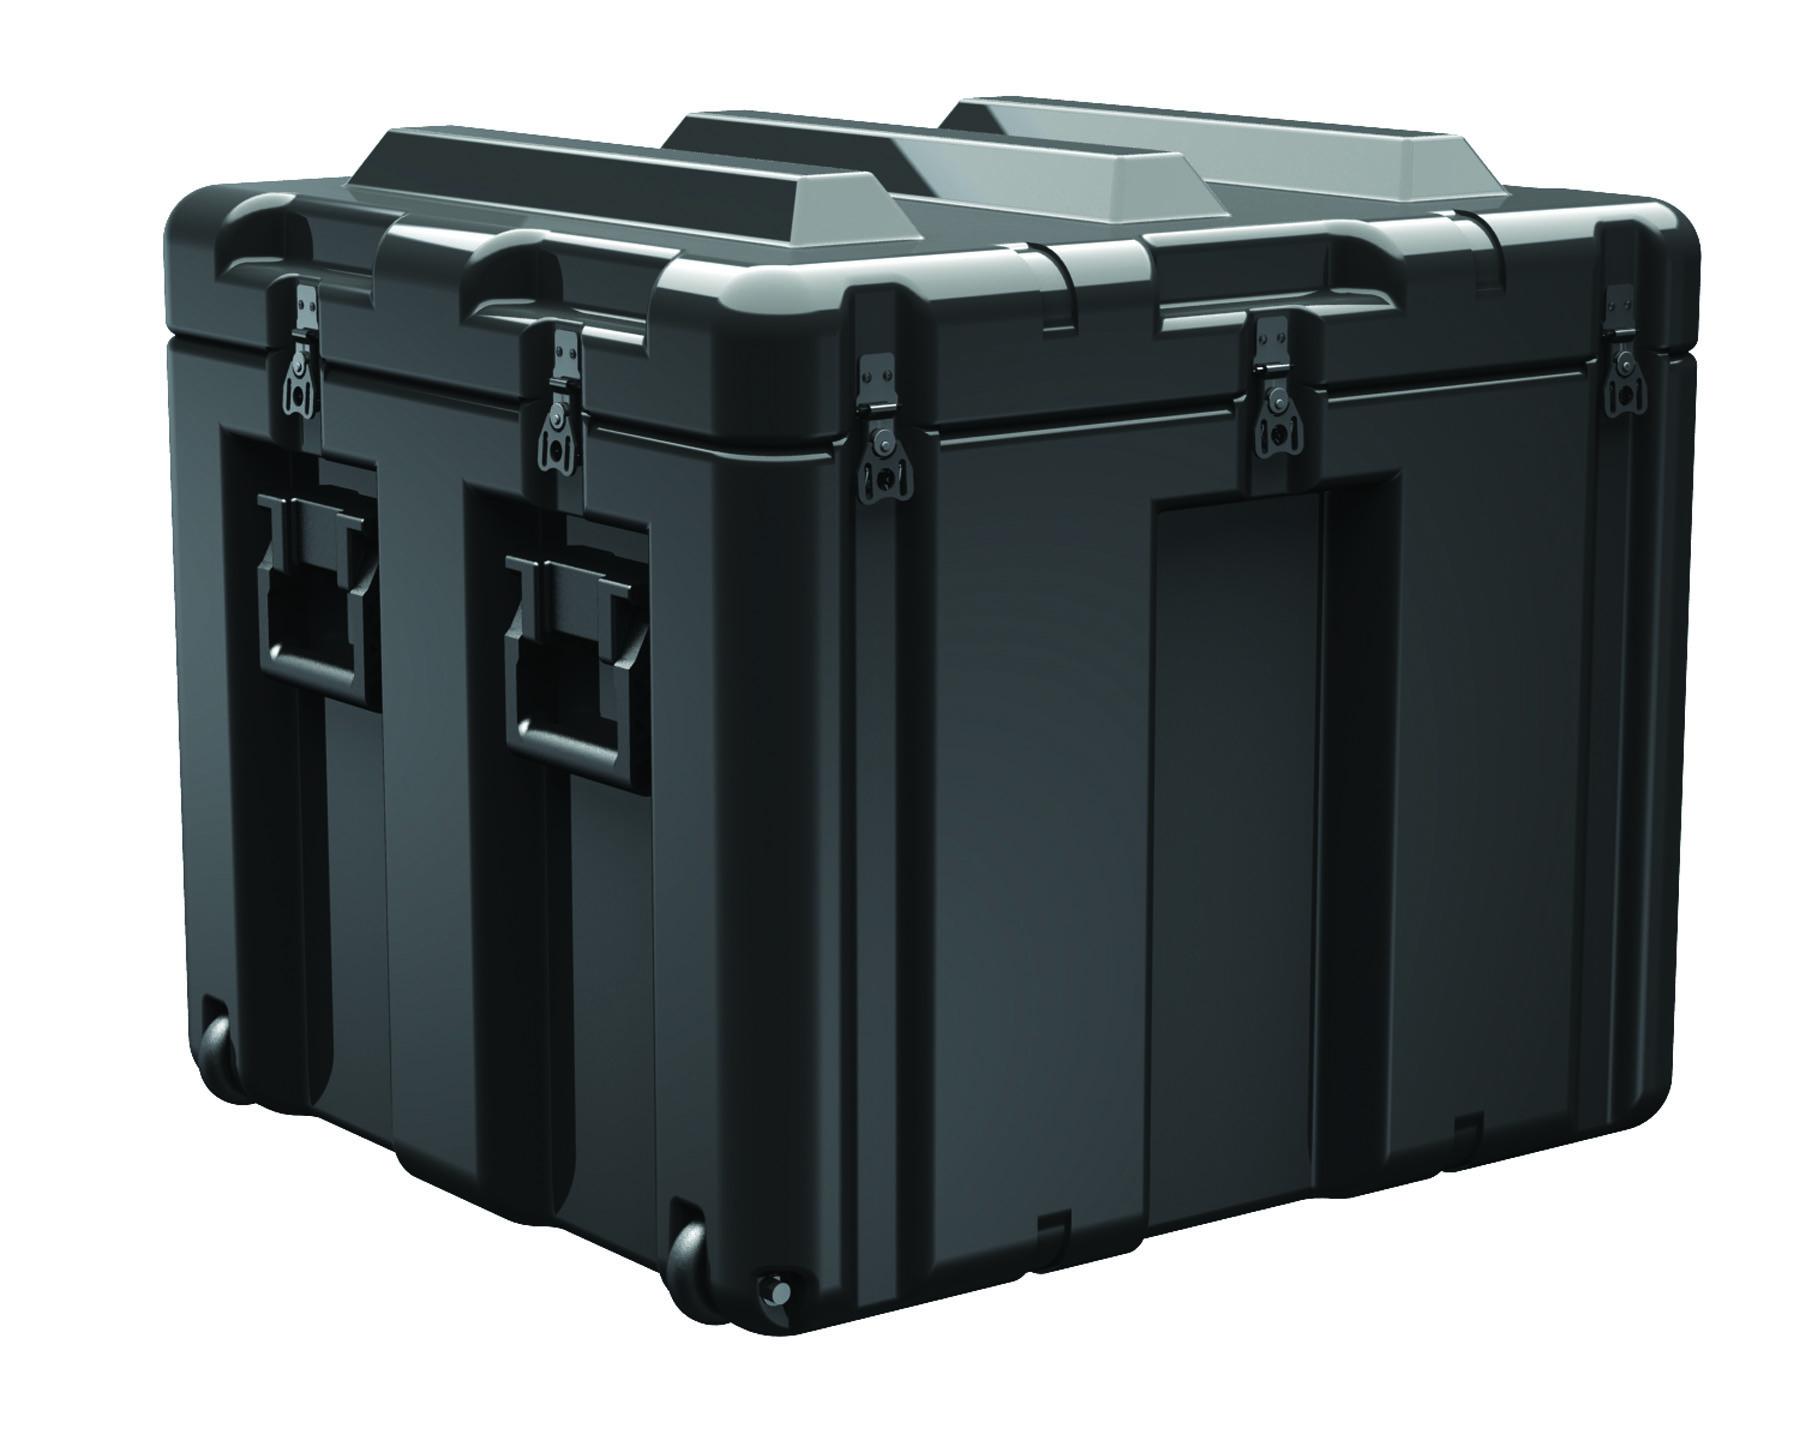 AL2624-1803 - Pelican Protective Cases AL2624-1803 - CasesTSA